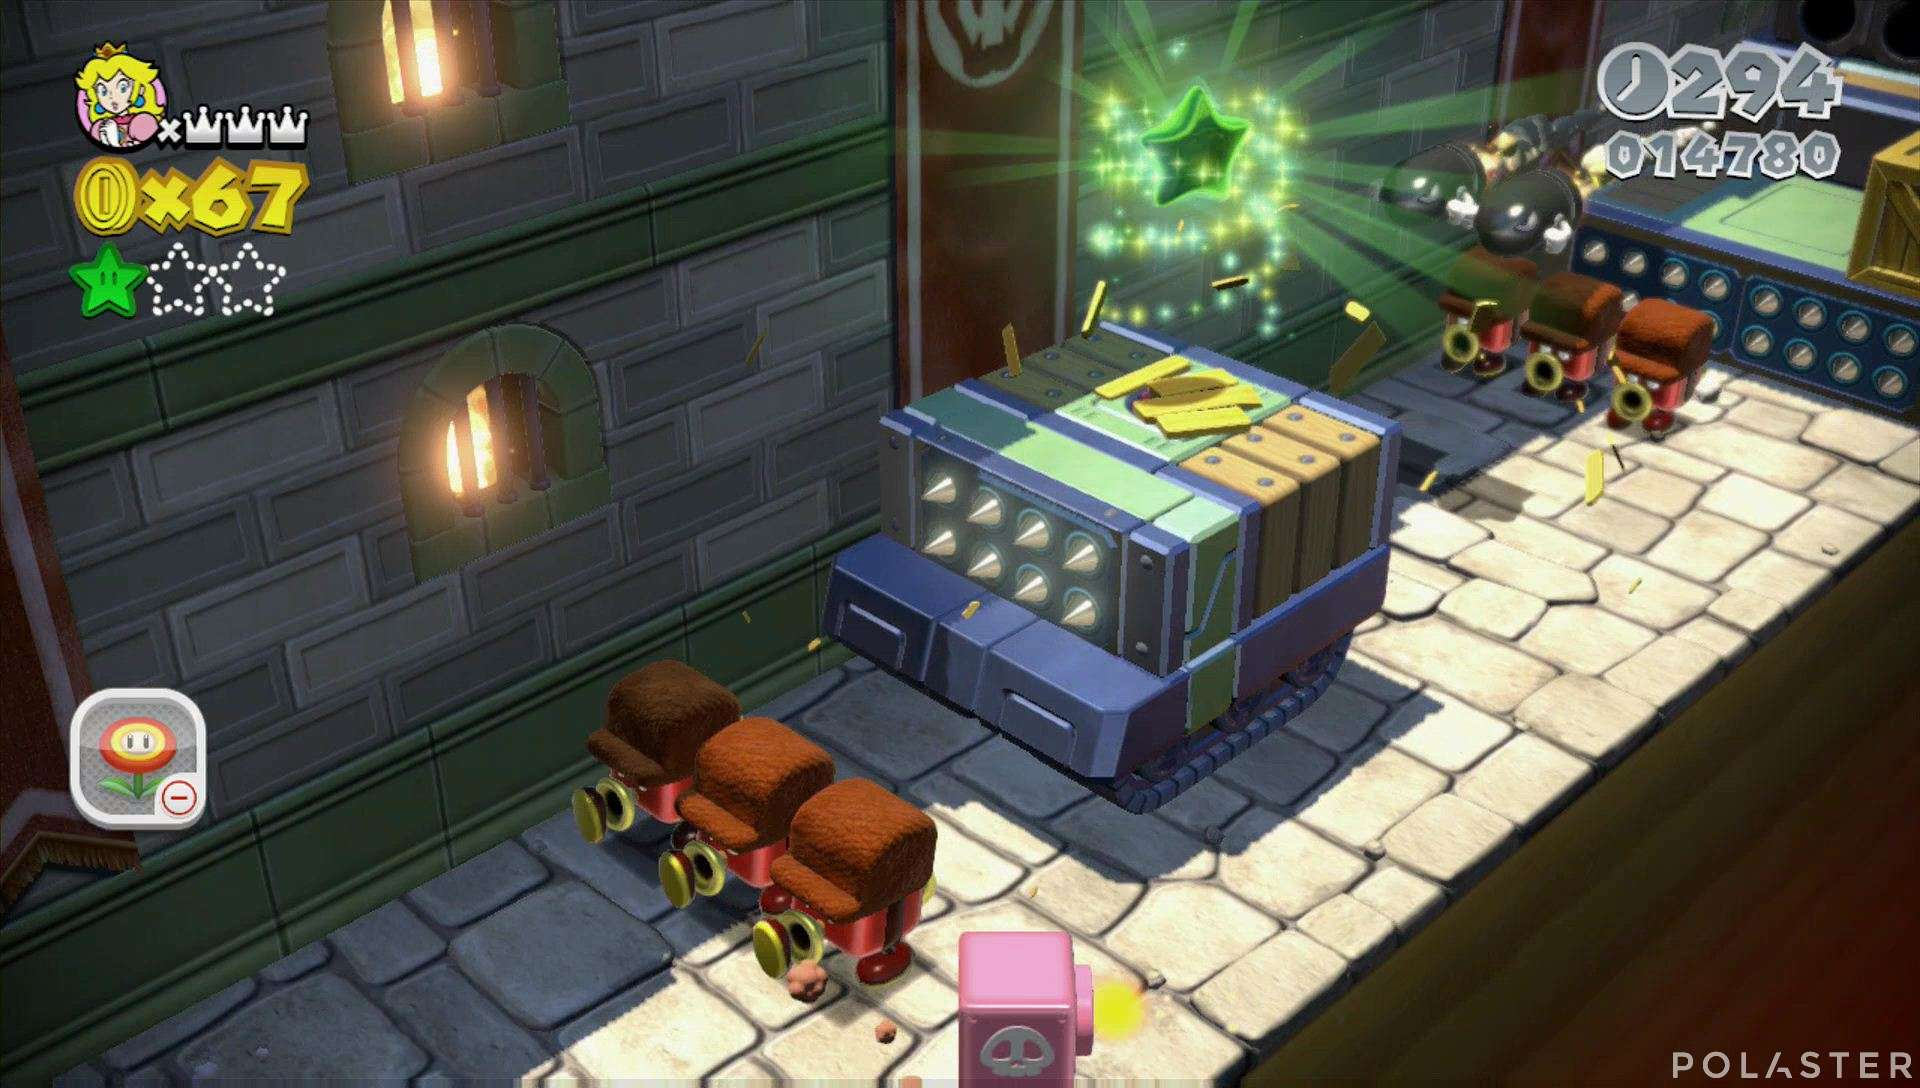 Super Mario 3D World Mundo 2-Castillo Estrella 2